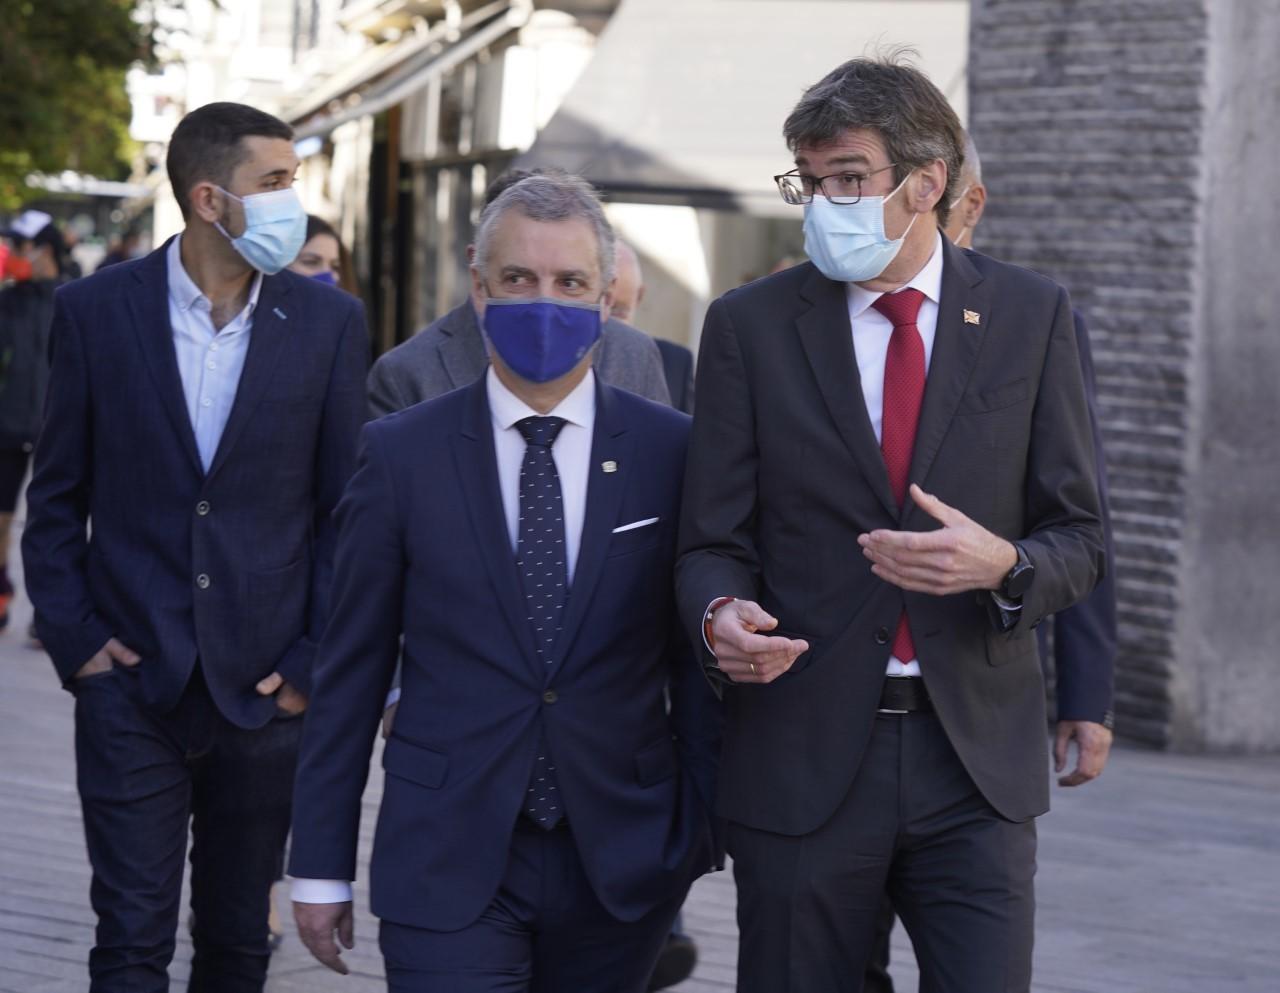 El lehendakari Urkullu acompañado por el alcalde de Vitoria Gorka Urtaran tras rubricar un acuerdo sobre la capitalidad del País Vasco.